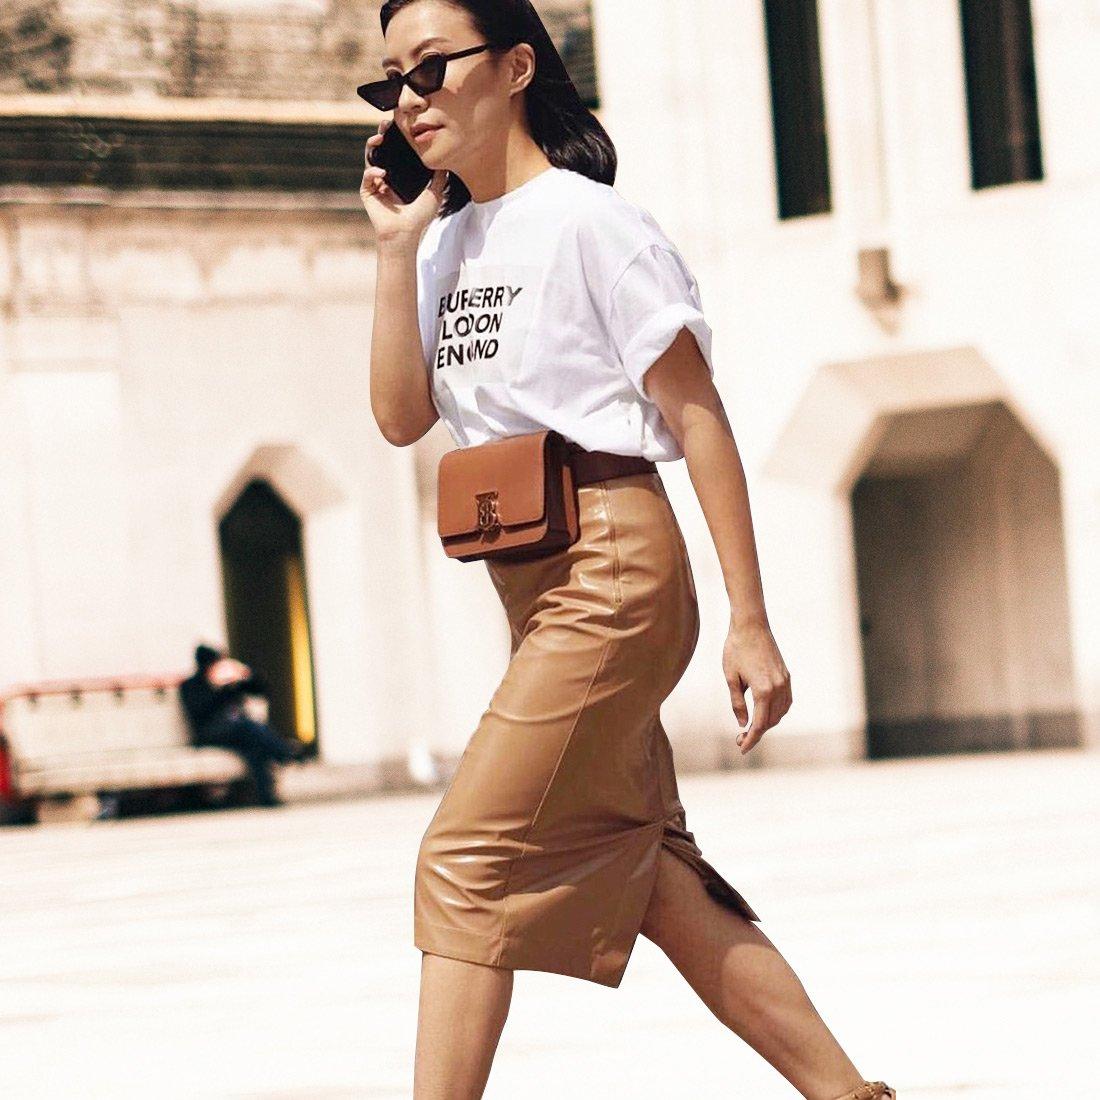 Street style: актуальные образы с юбкой